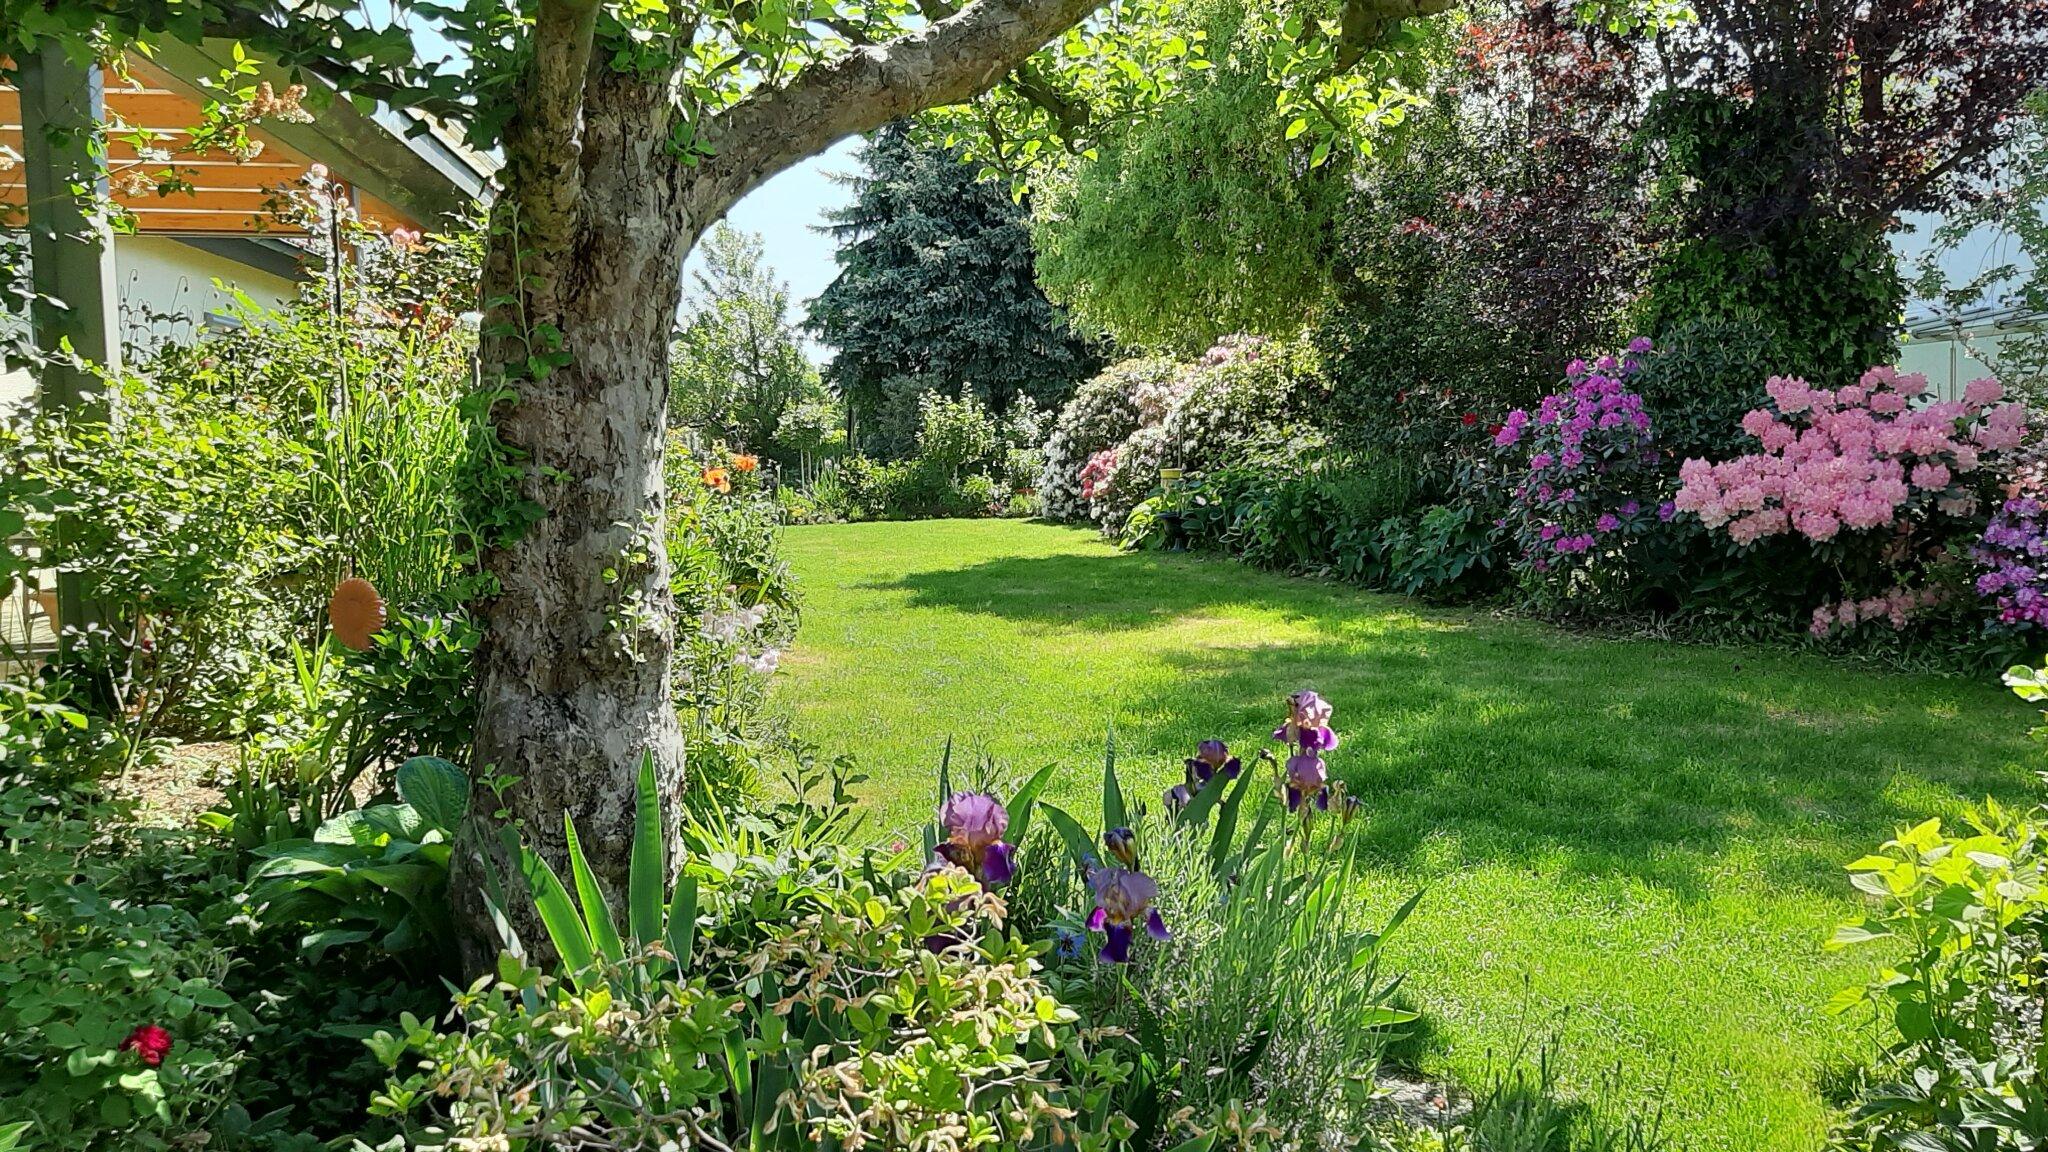 Gartenben�tzung erlaubt